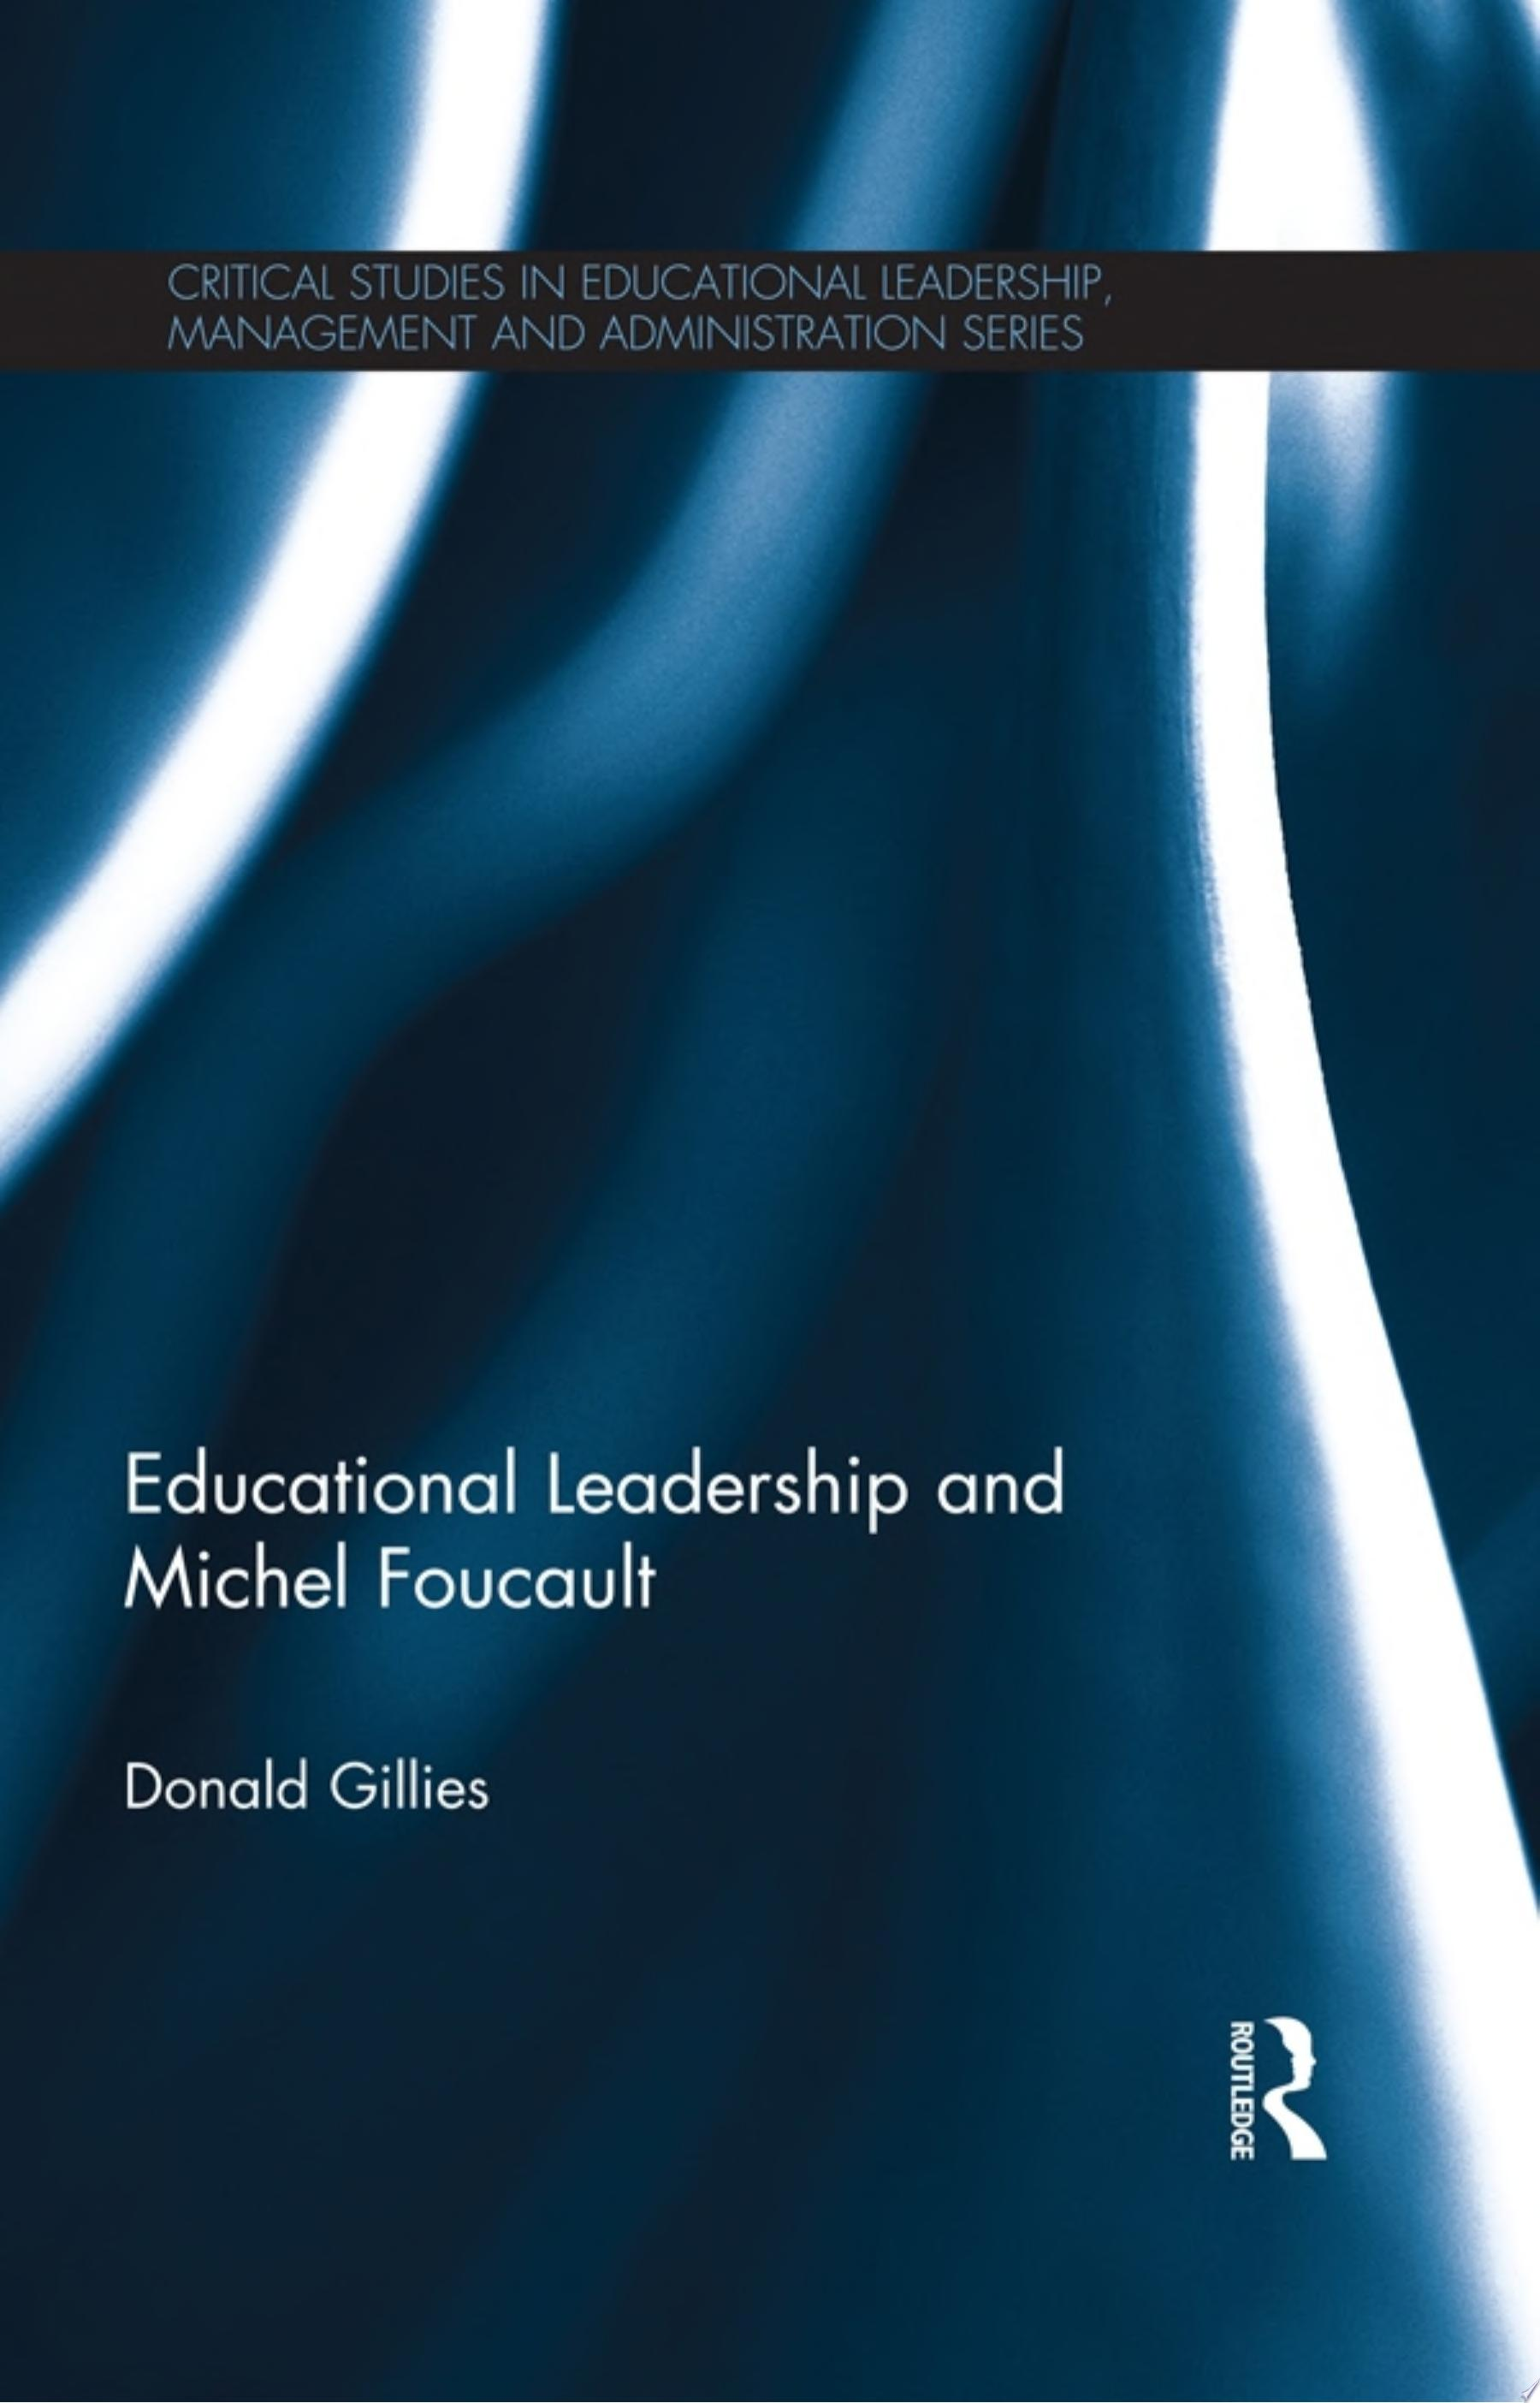 Educational Leadership and Michel Foucault